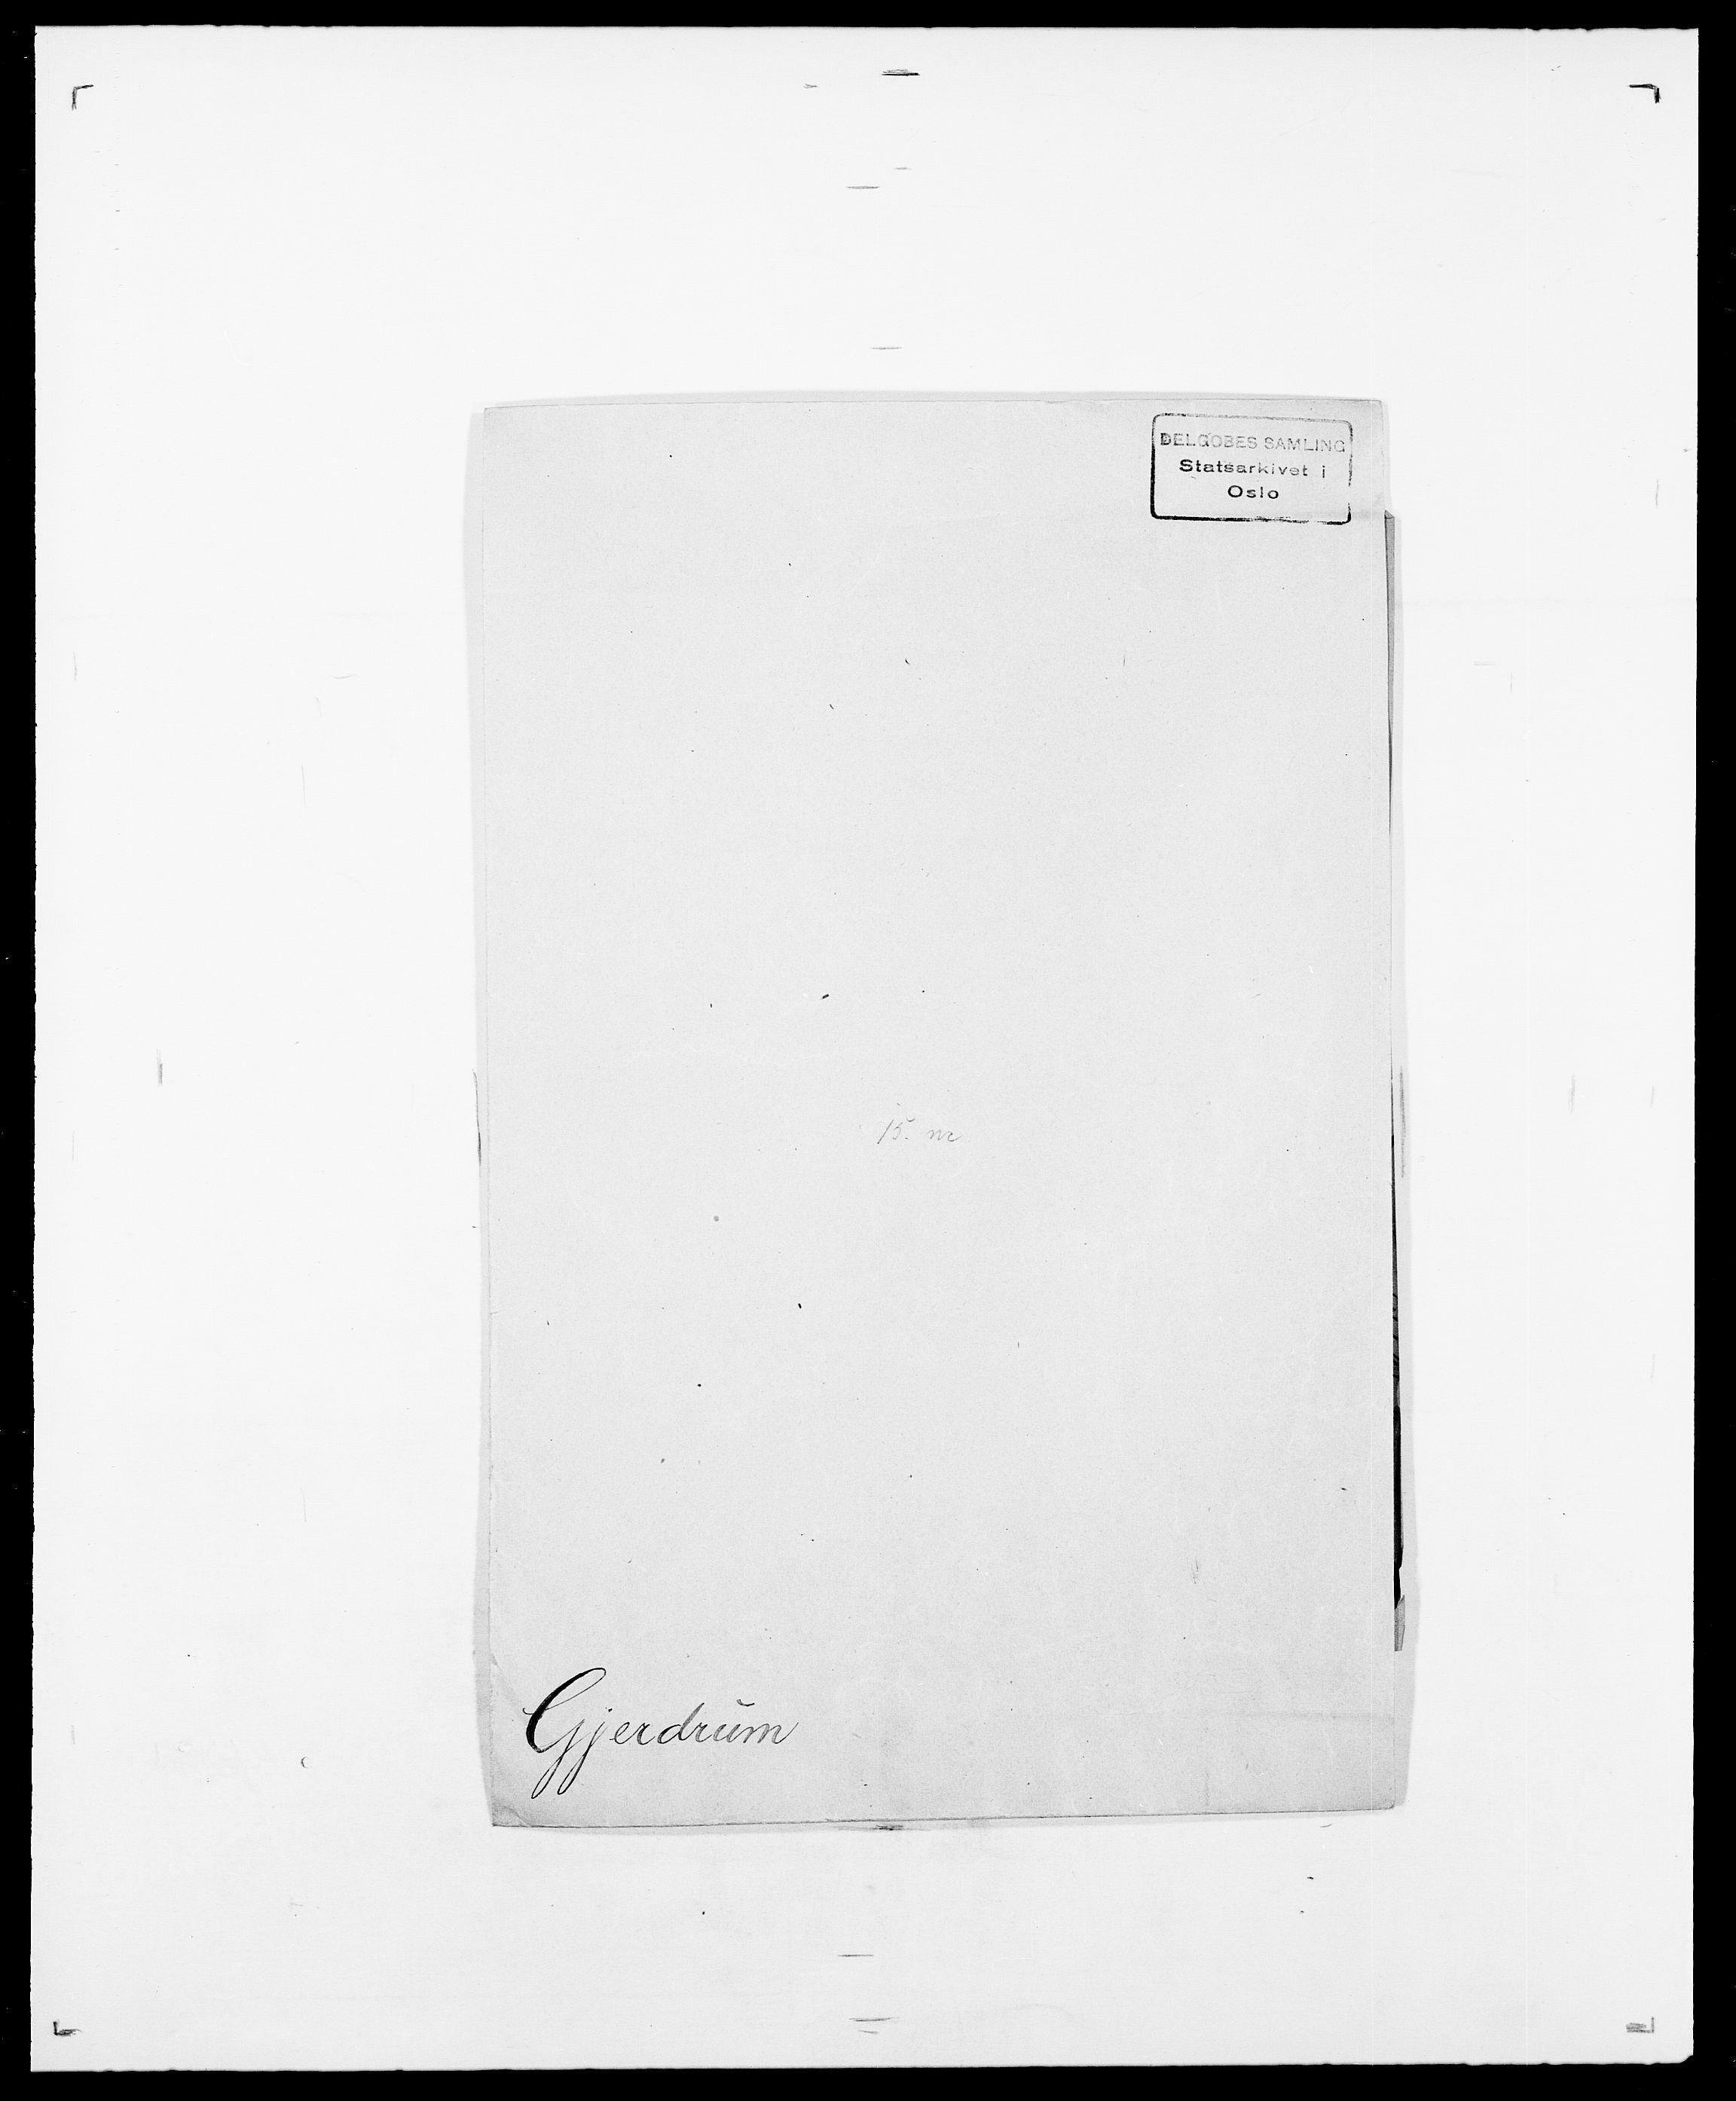 SAO, Delgobe, Charles Antoine - samling, D/Da/L0014: Giebdhausen - Grip, s. 119